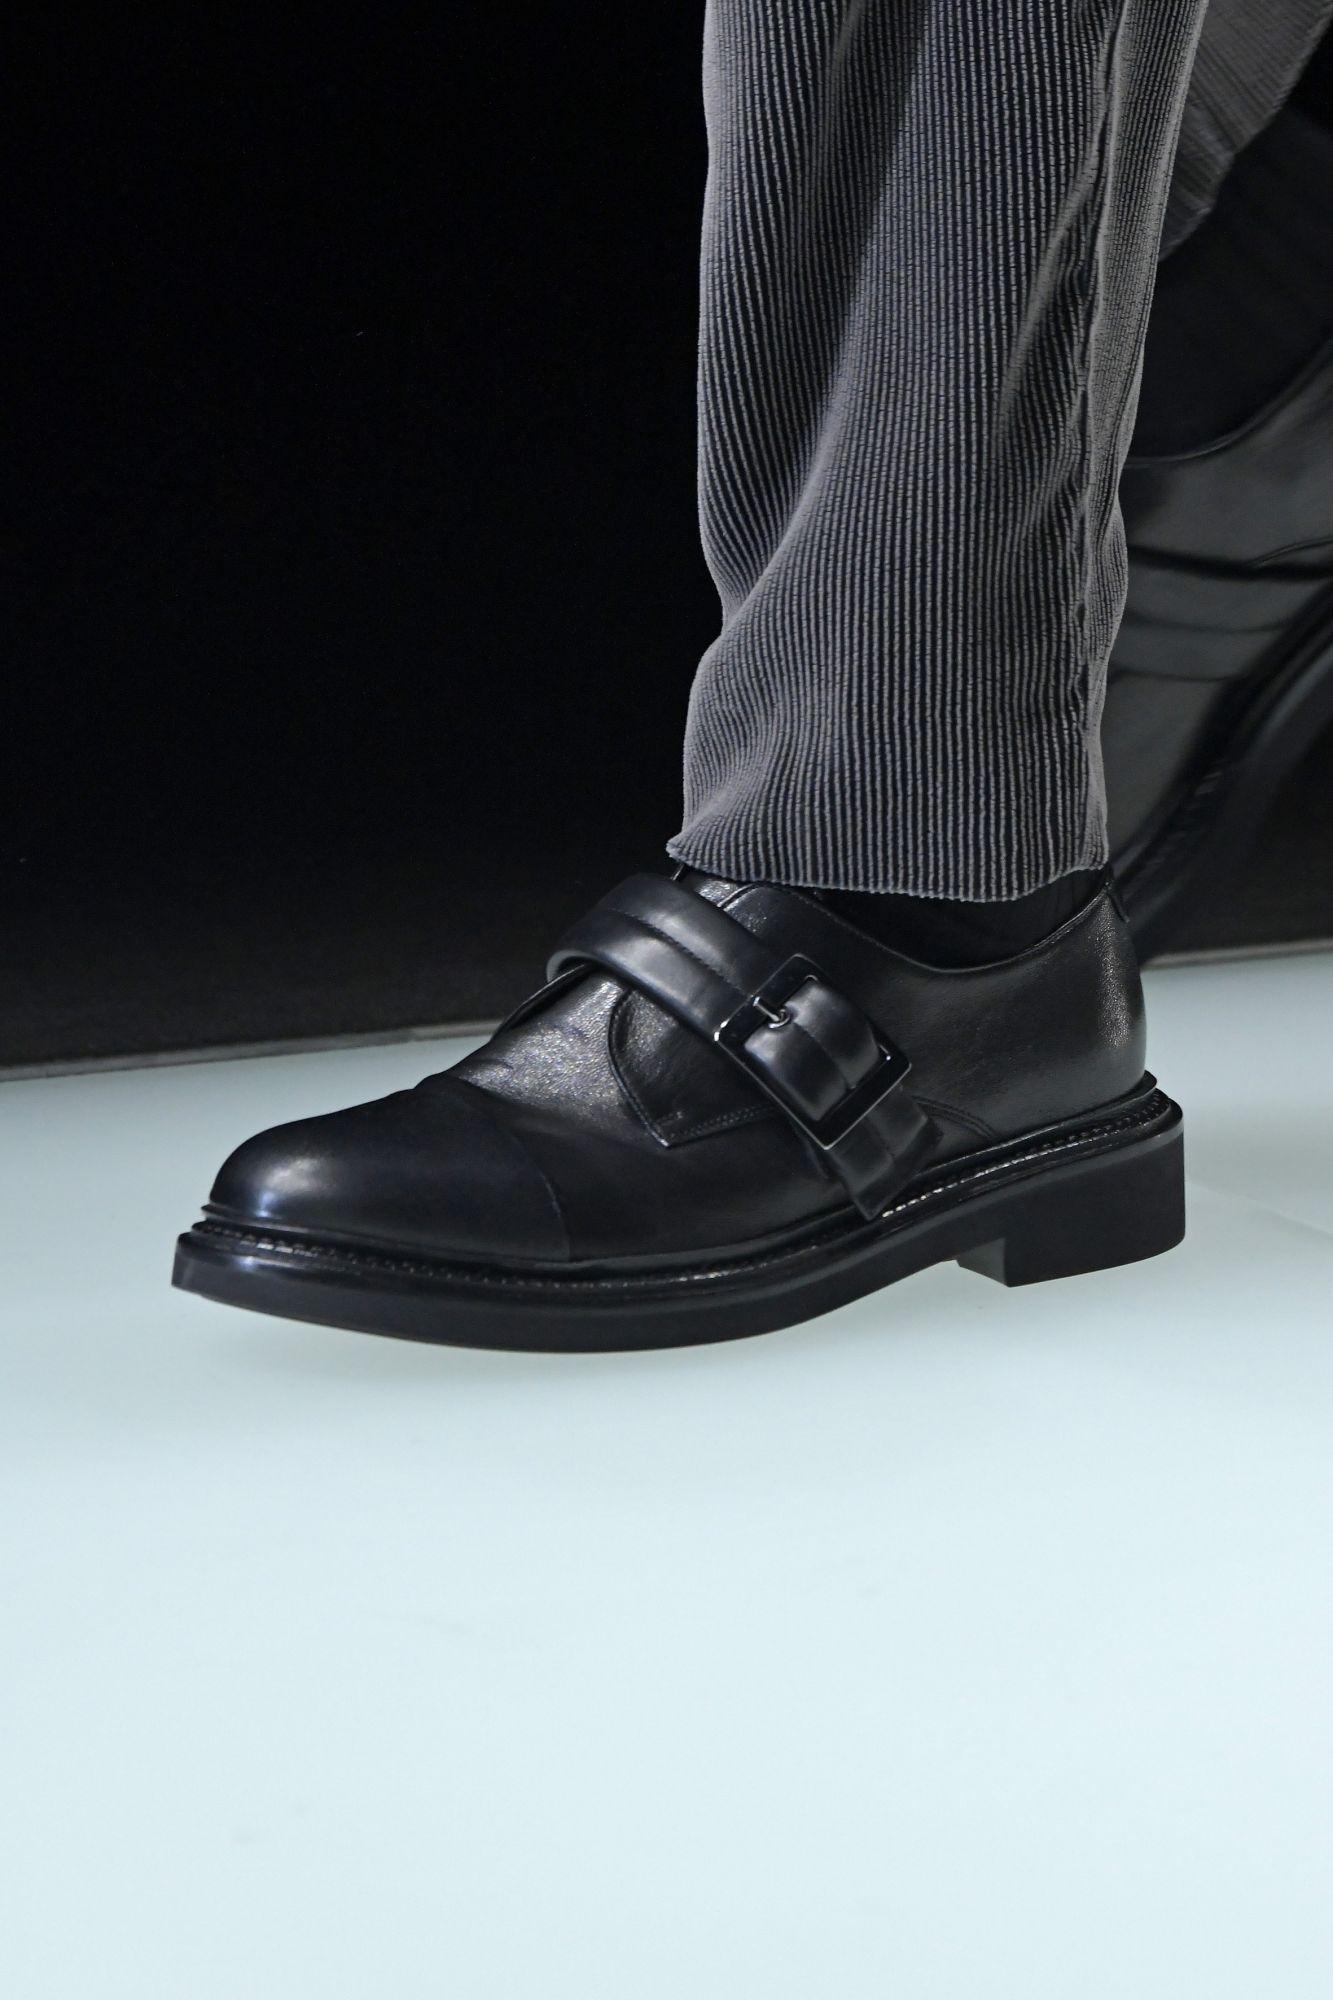 Giorgio Armani: 5 Fashion Trends You